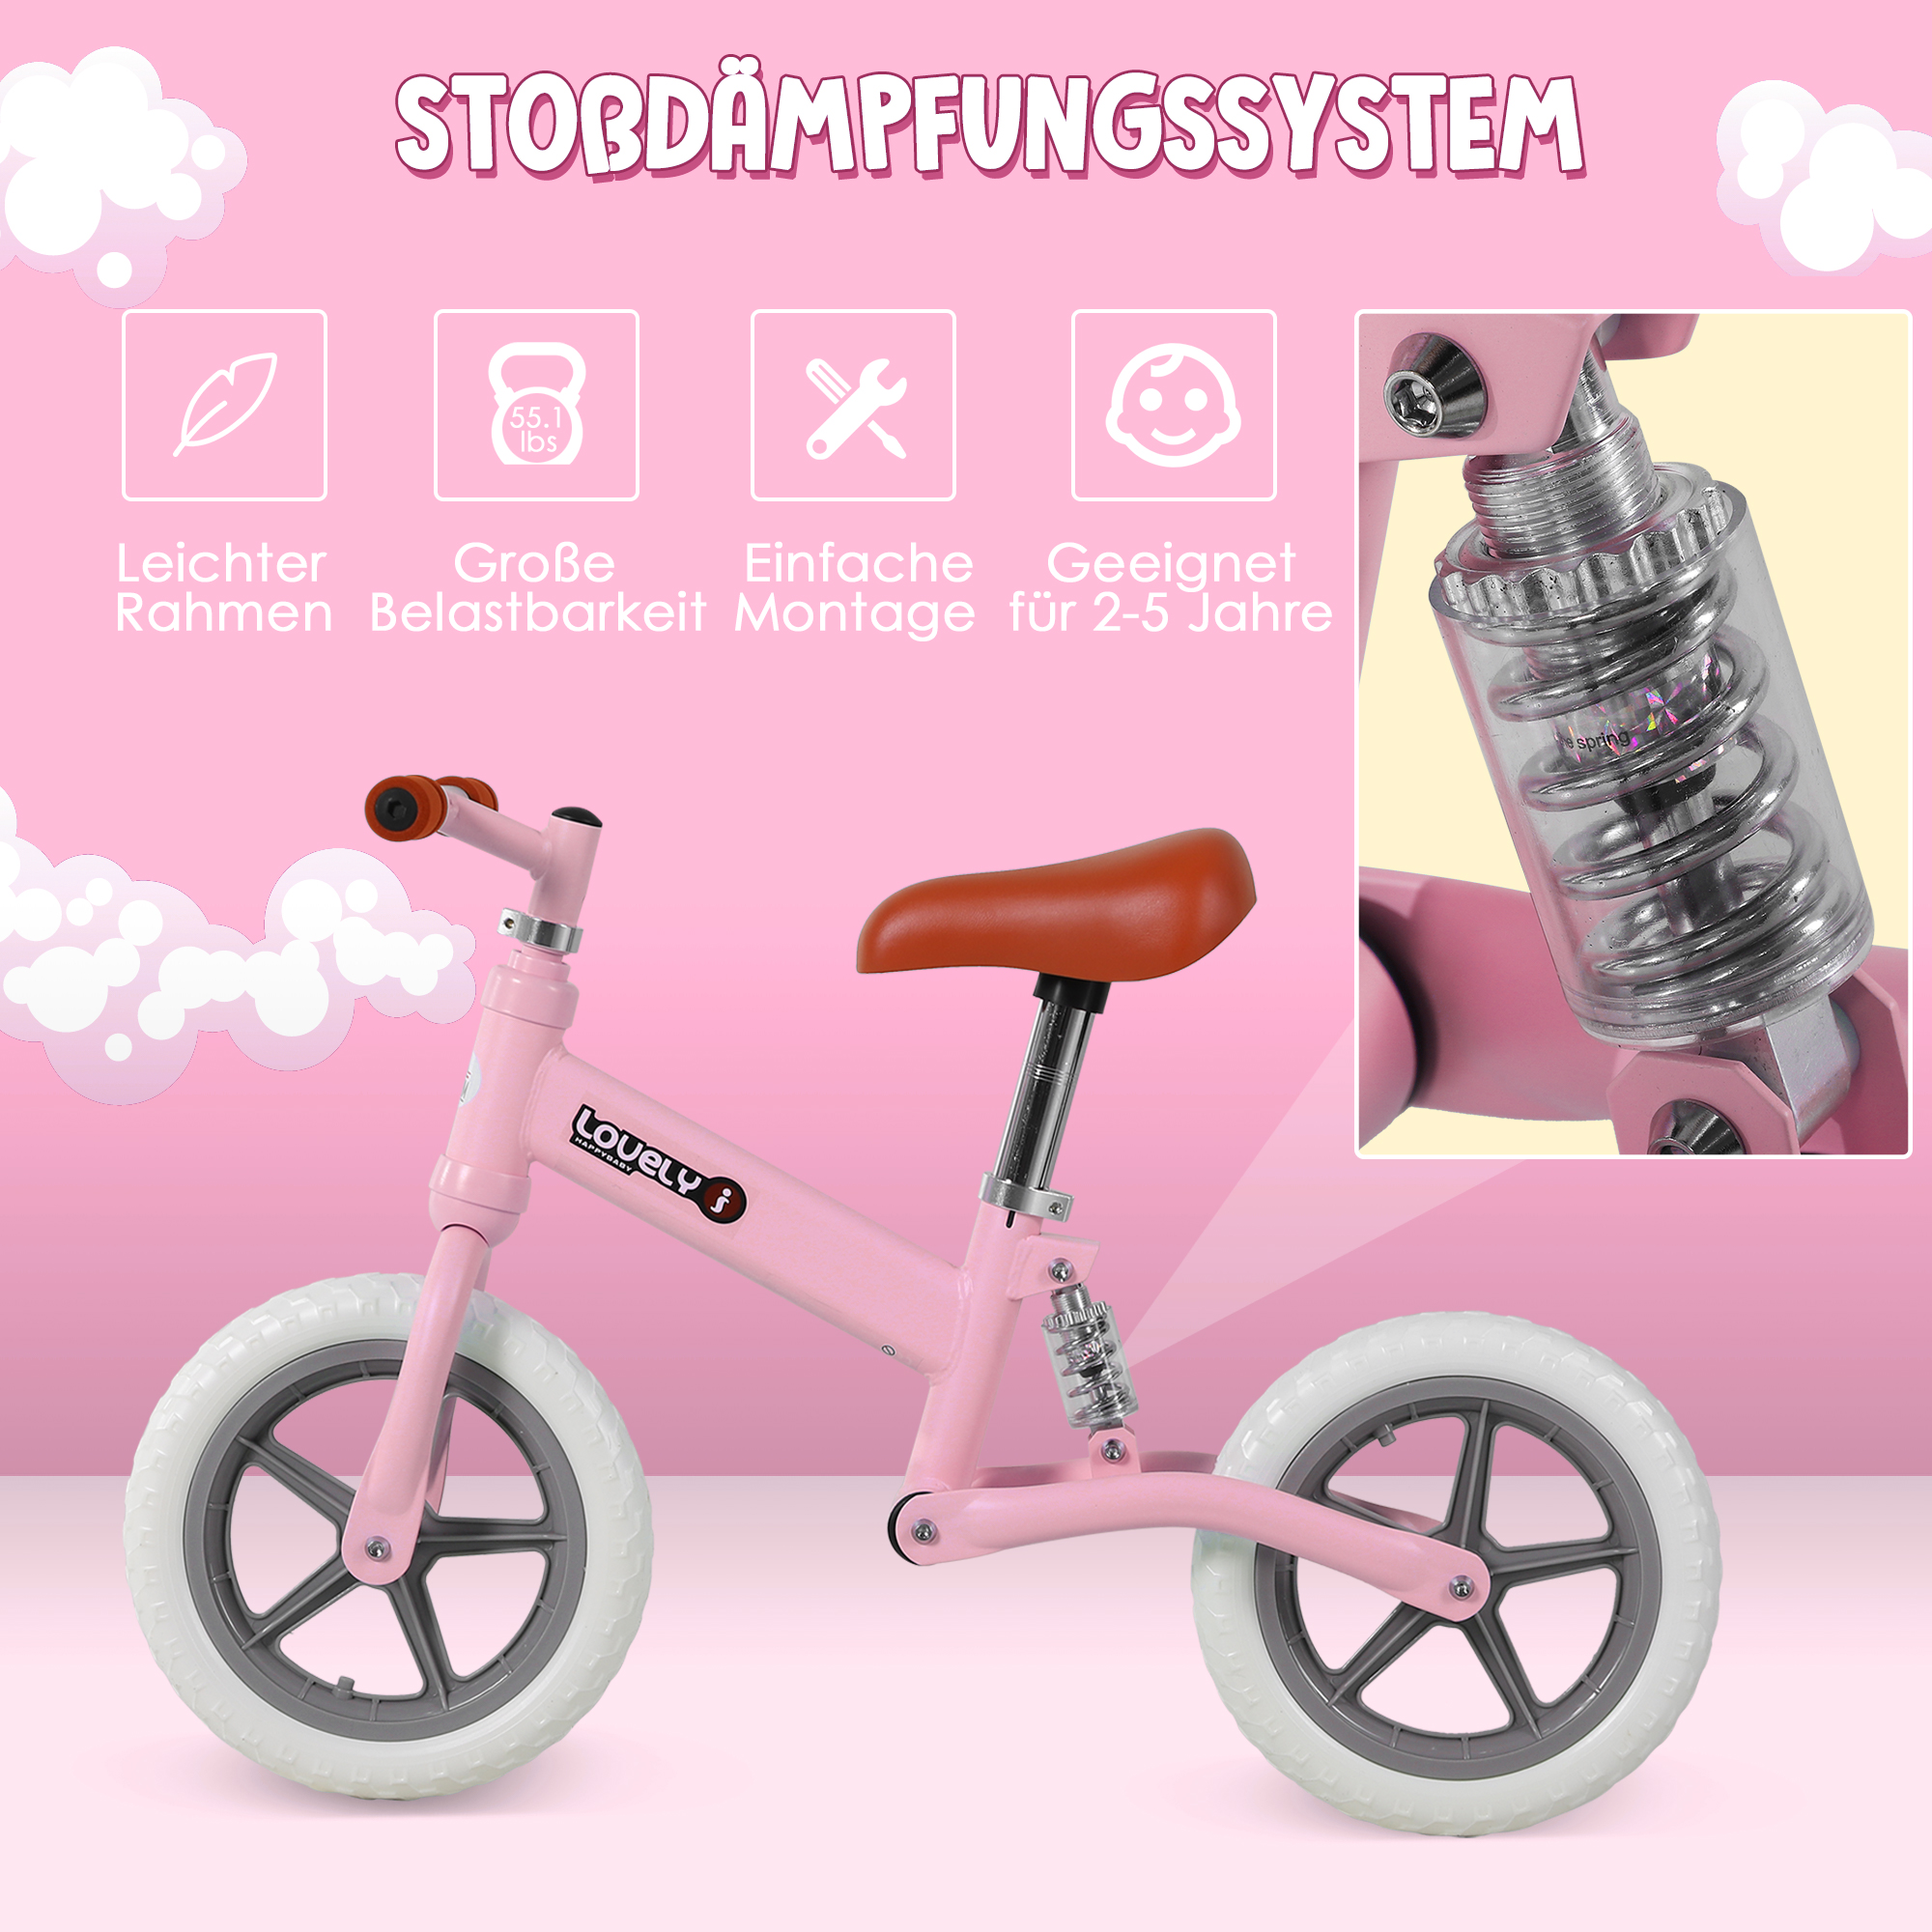 Indexbild 22 - HOMCOM Laufrad mit Stoßdämpfer Kinderrad Lauflernrad Balance Bike 2-5 Jahre